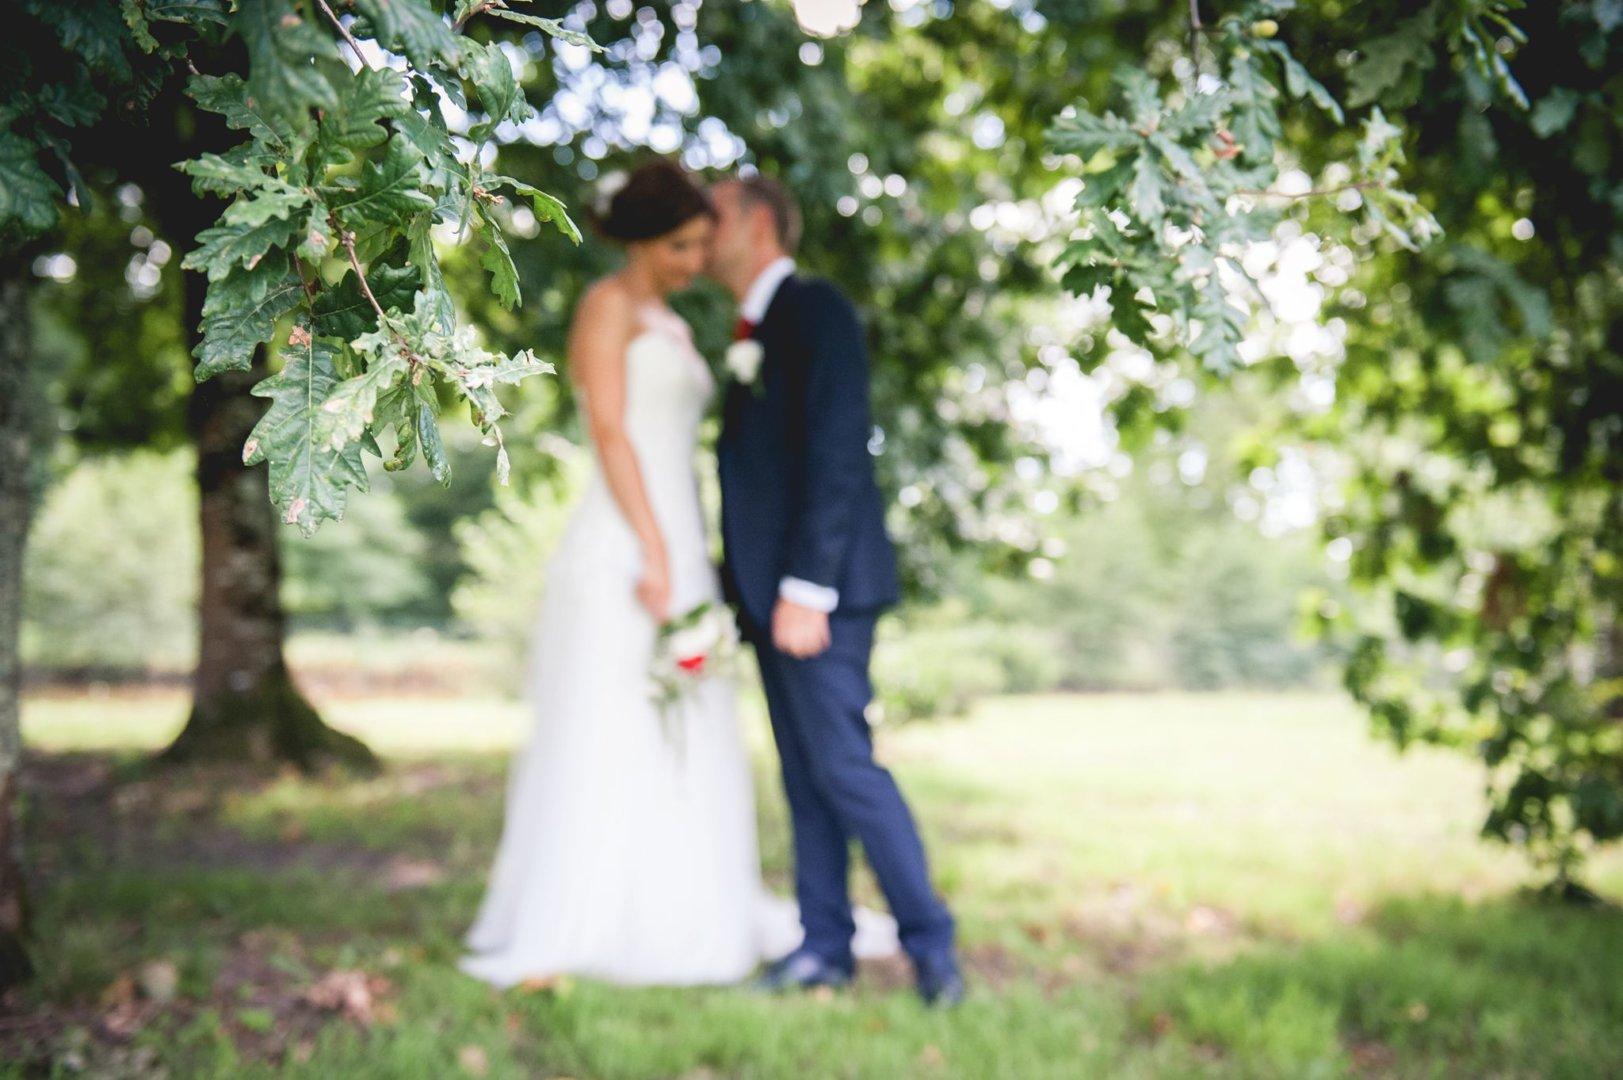 wedding day and beautiful love